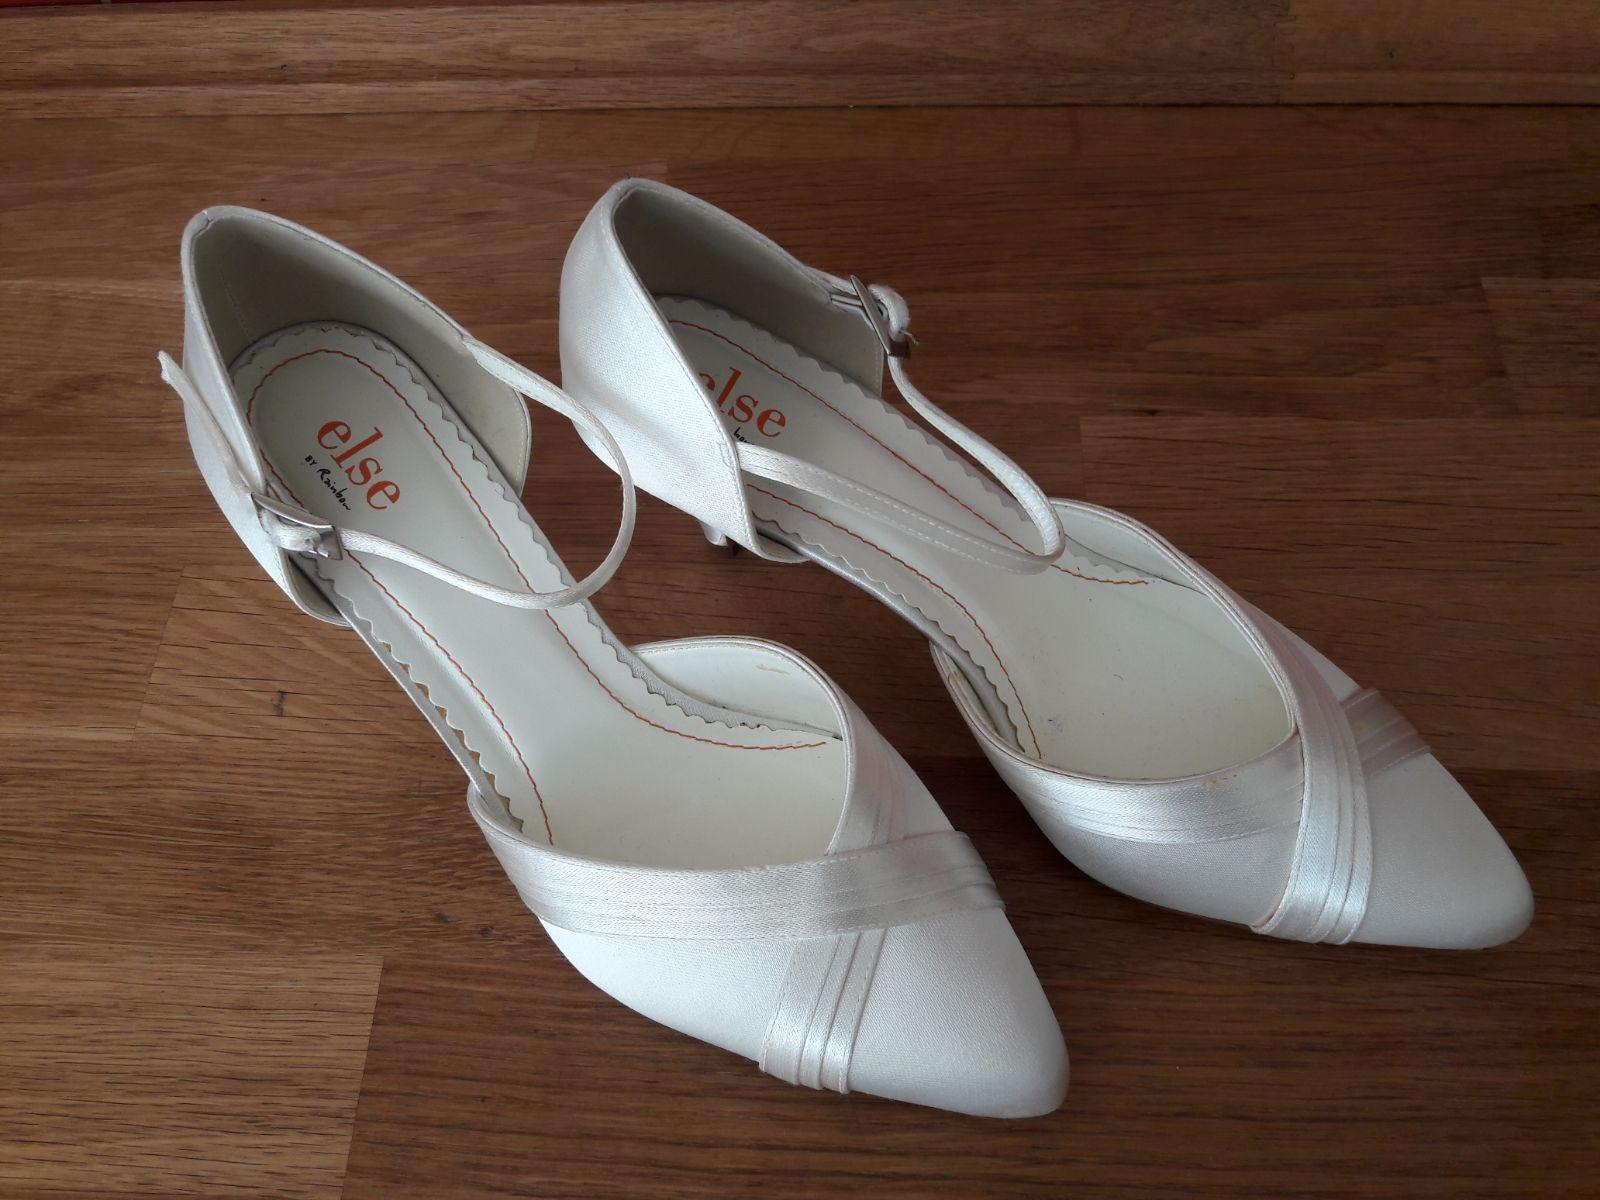 biele svadobne topanky - Obrázok č. 2